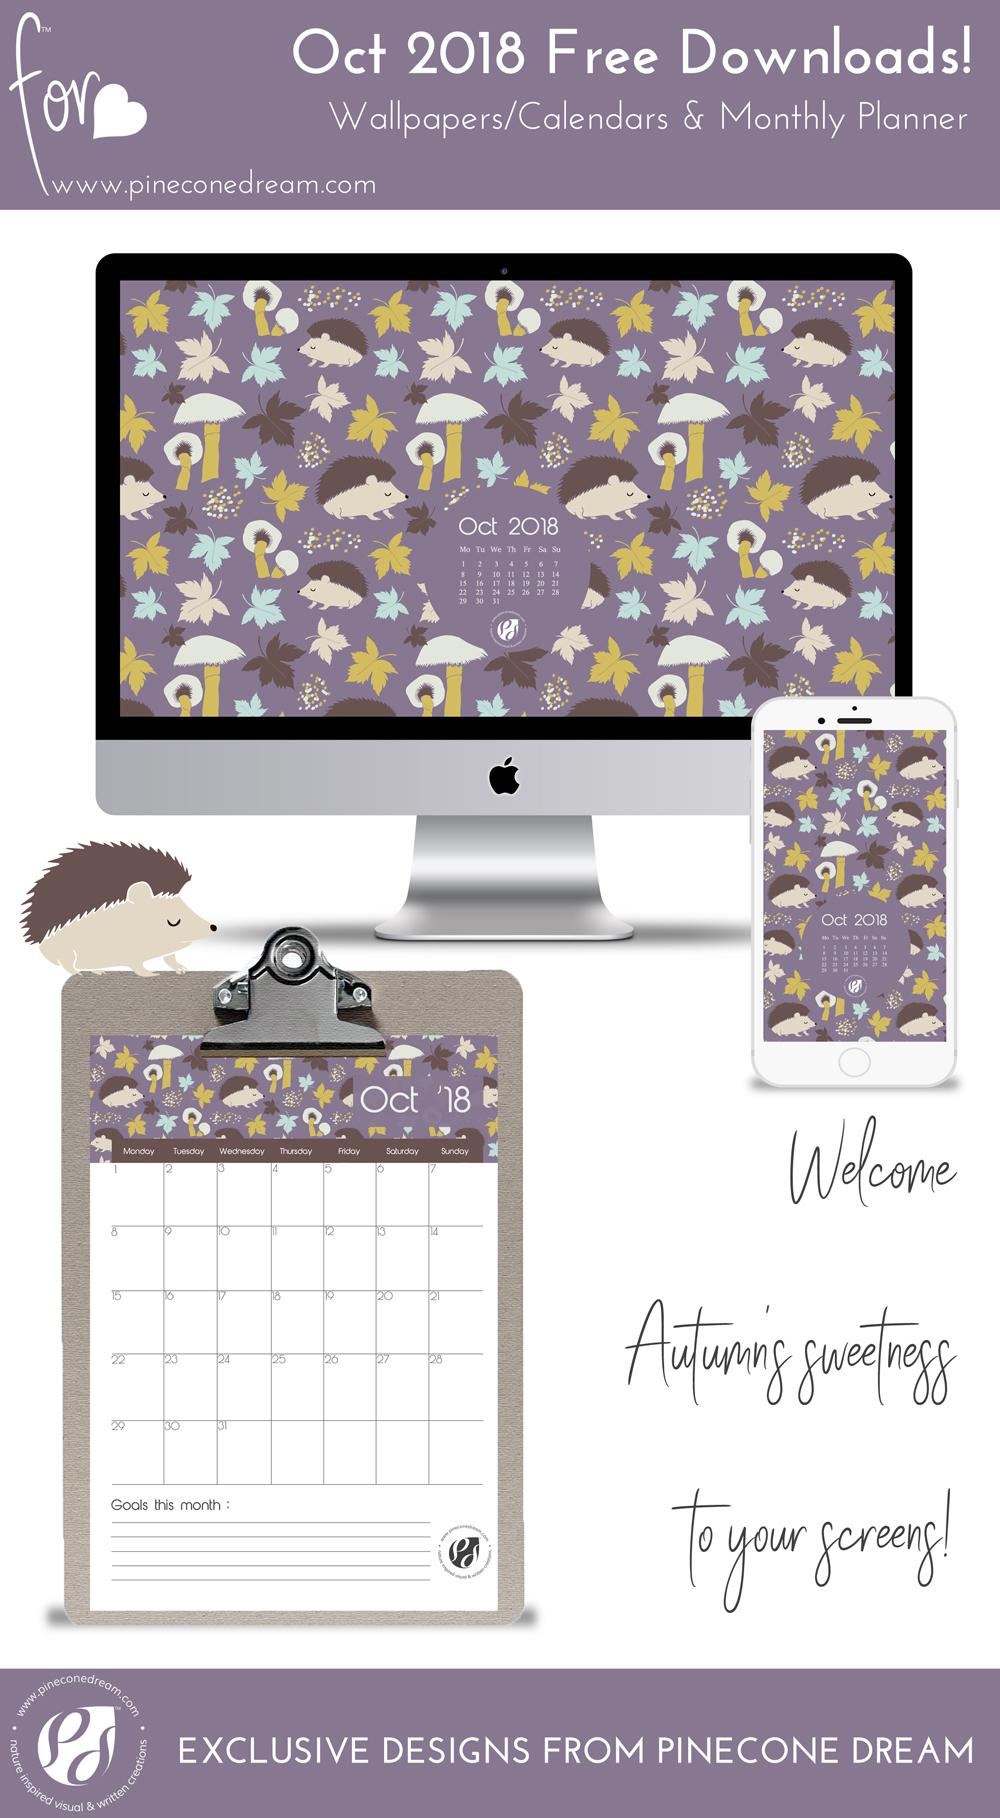 Wallpapers&Calendars_Bundle_Pineconedream2